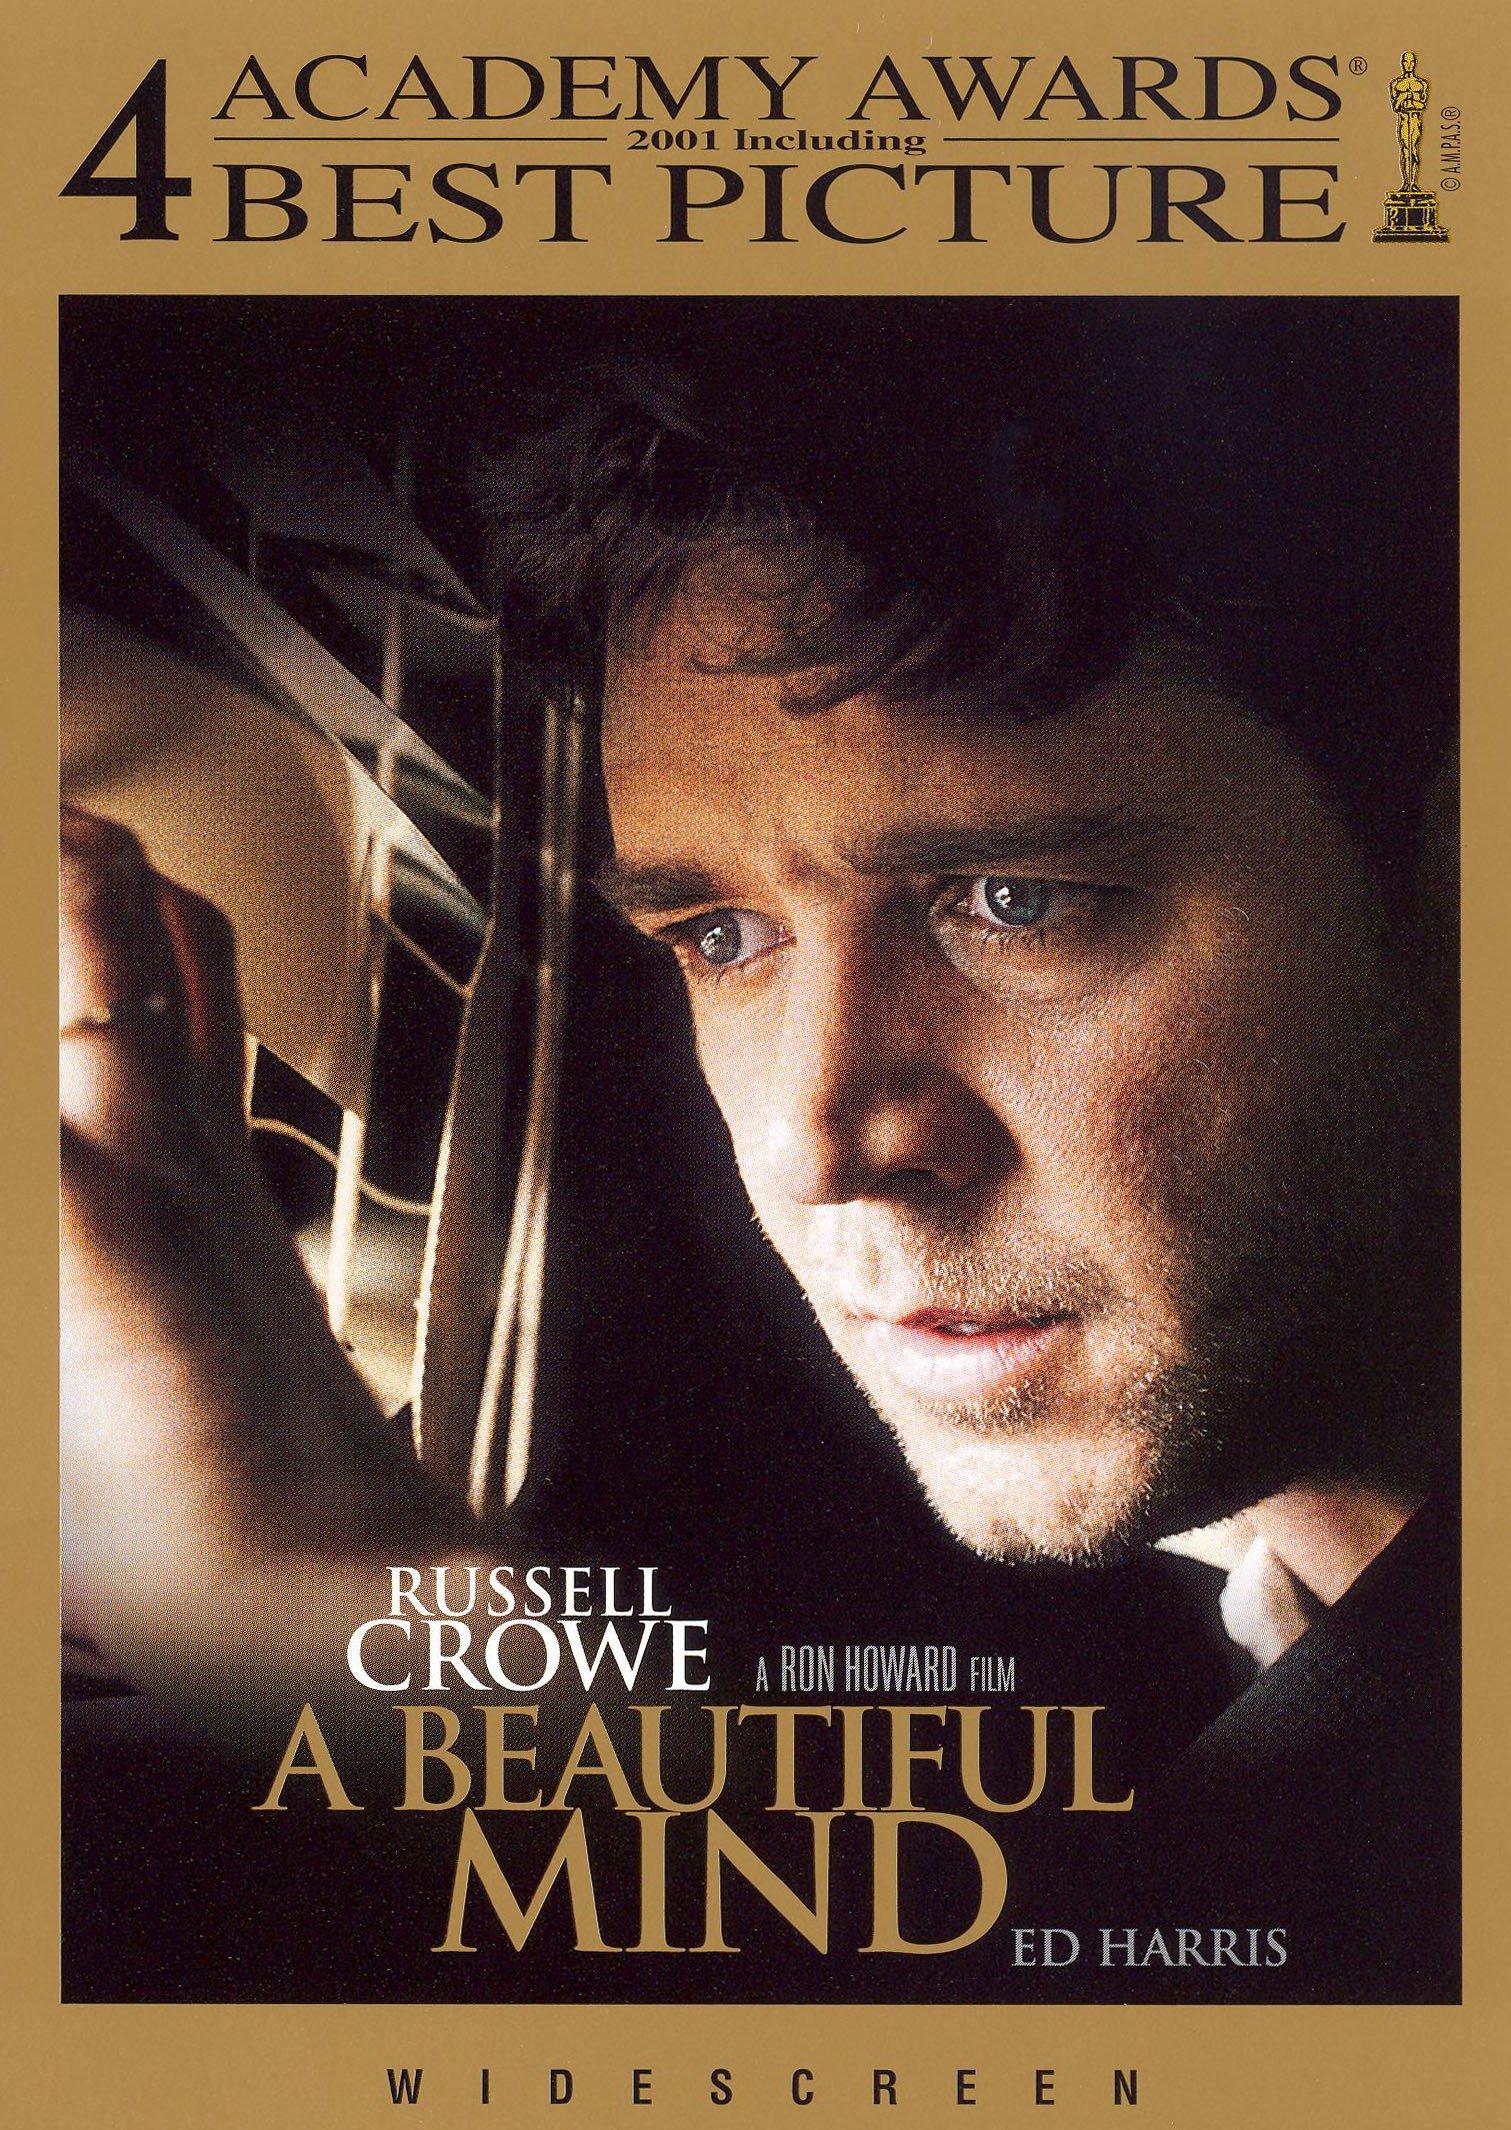 DVD Review: A Beautiful Mind - Slant Magazine